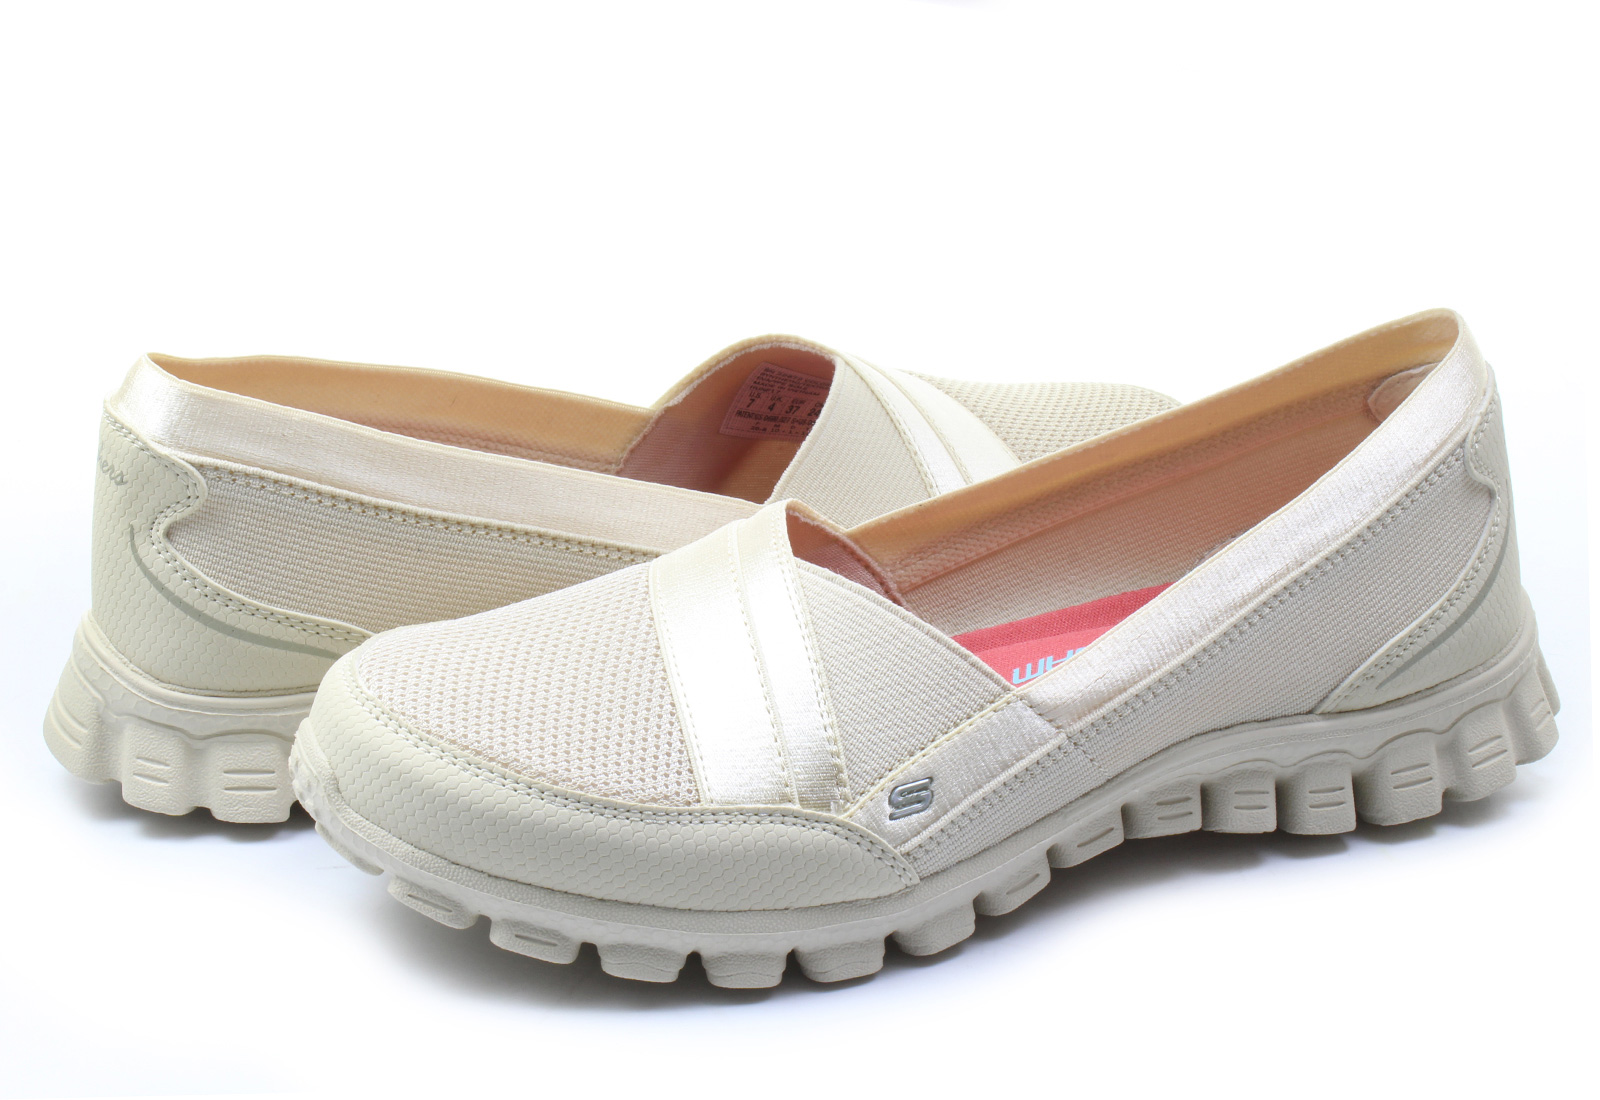 Skechers Shoes For Men Waterproof